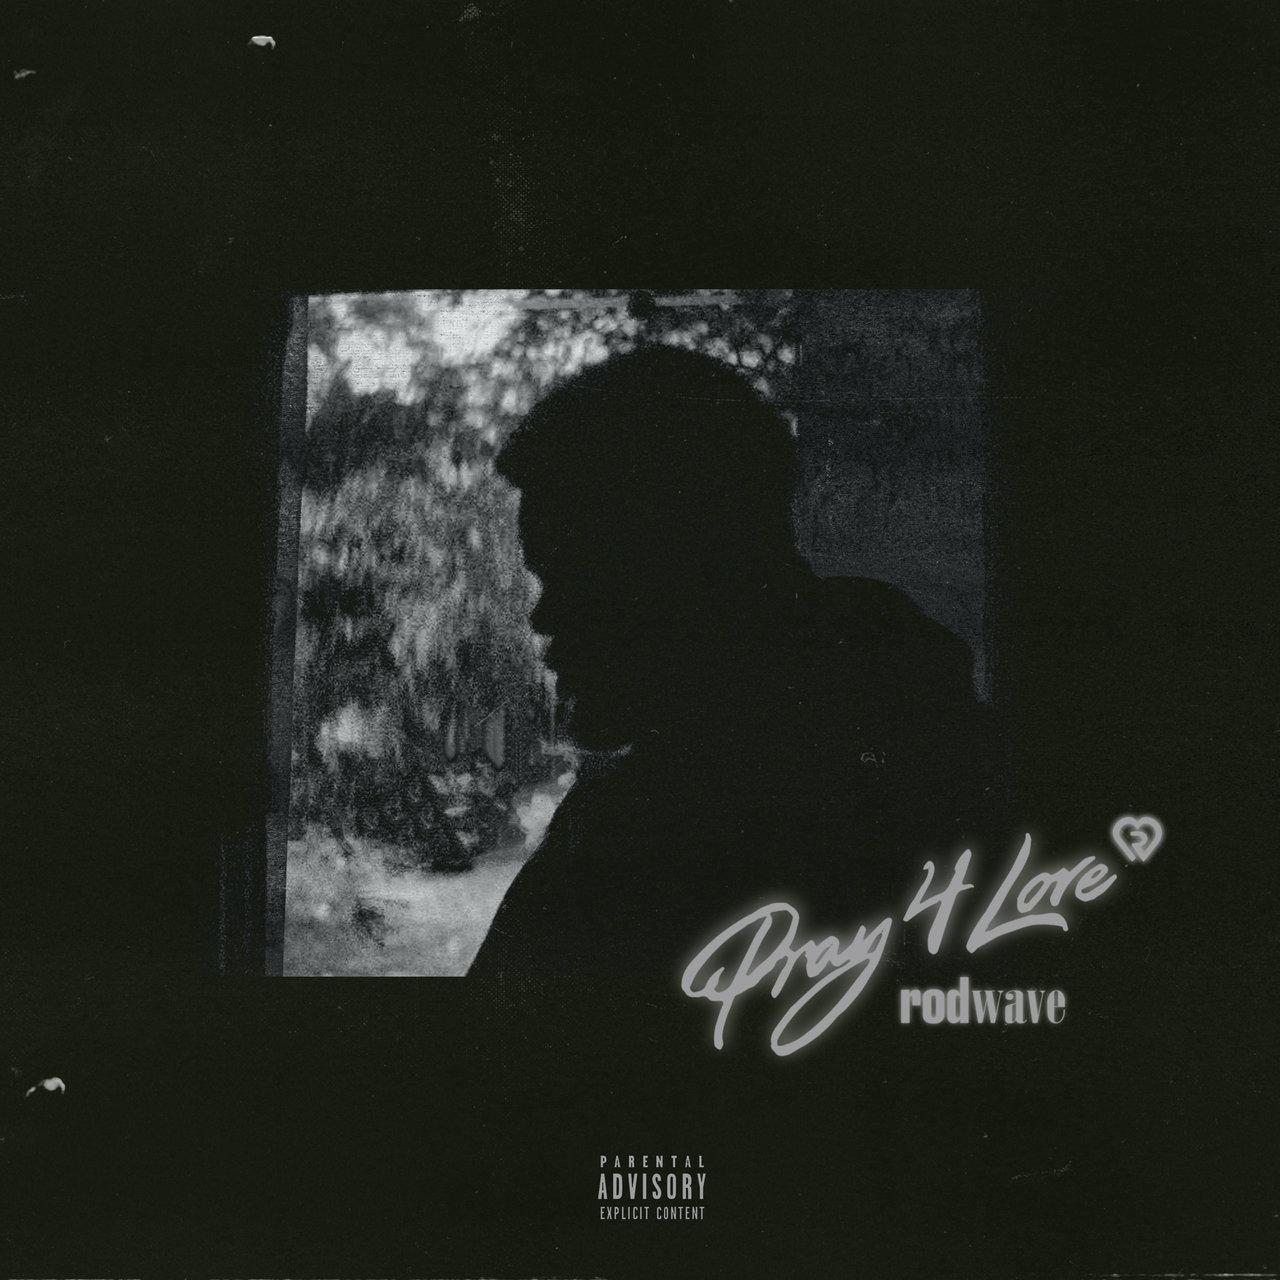 Rod Wave - Pray 4 Love (Cover)